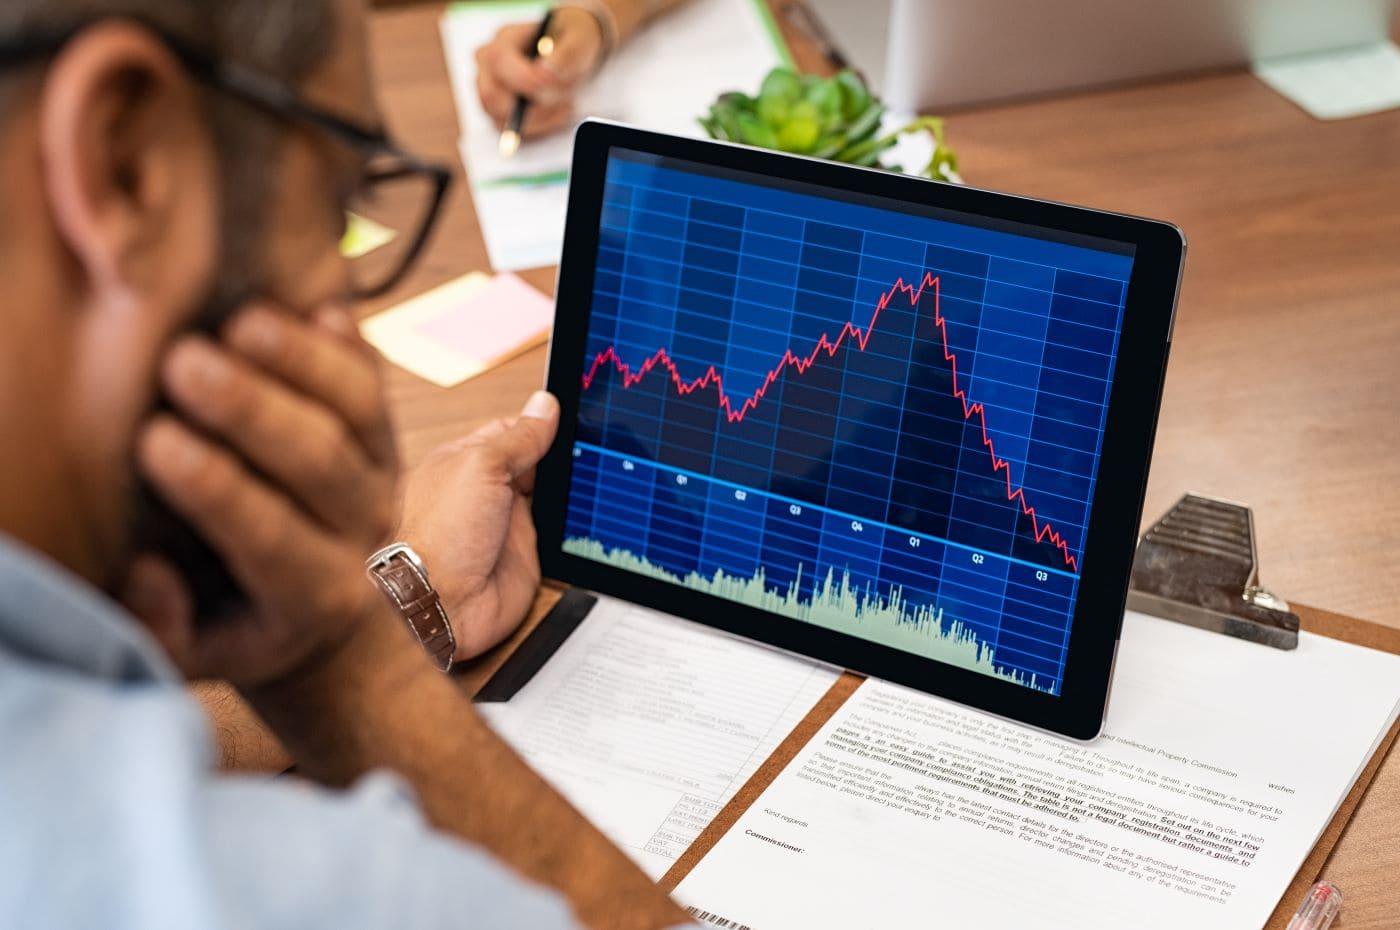 Der Bitcoin Kurs - Prognose & Preisniveaustabilität